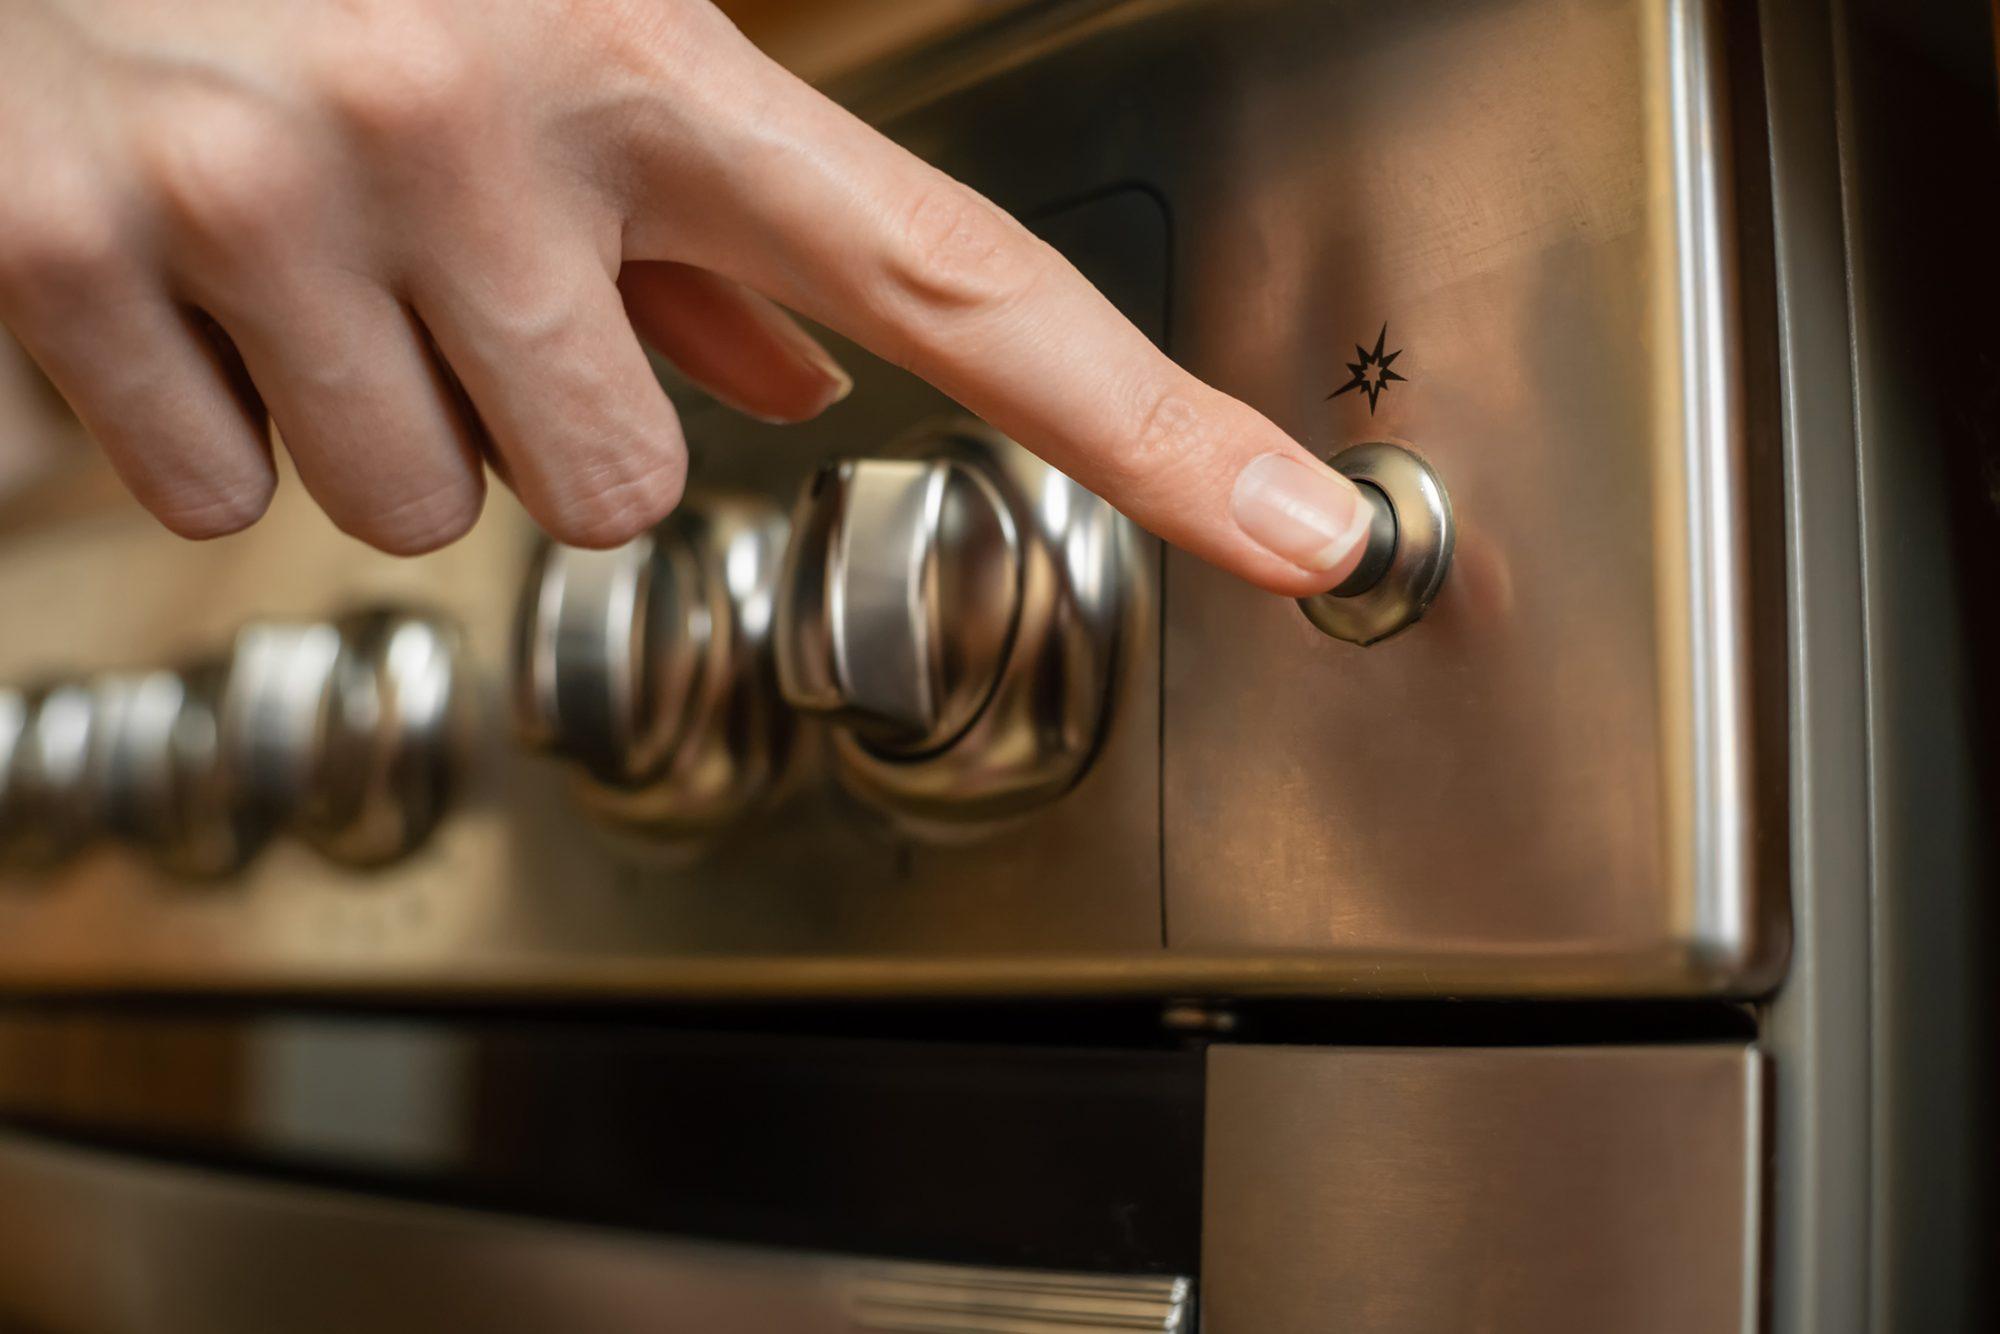 turning-on-oven-1248916182.jpg